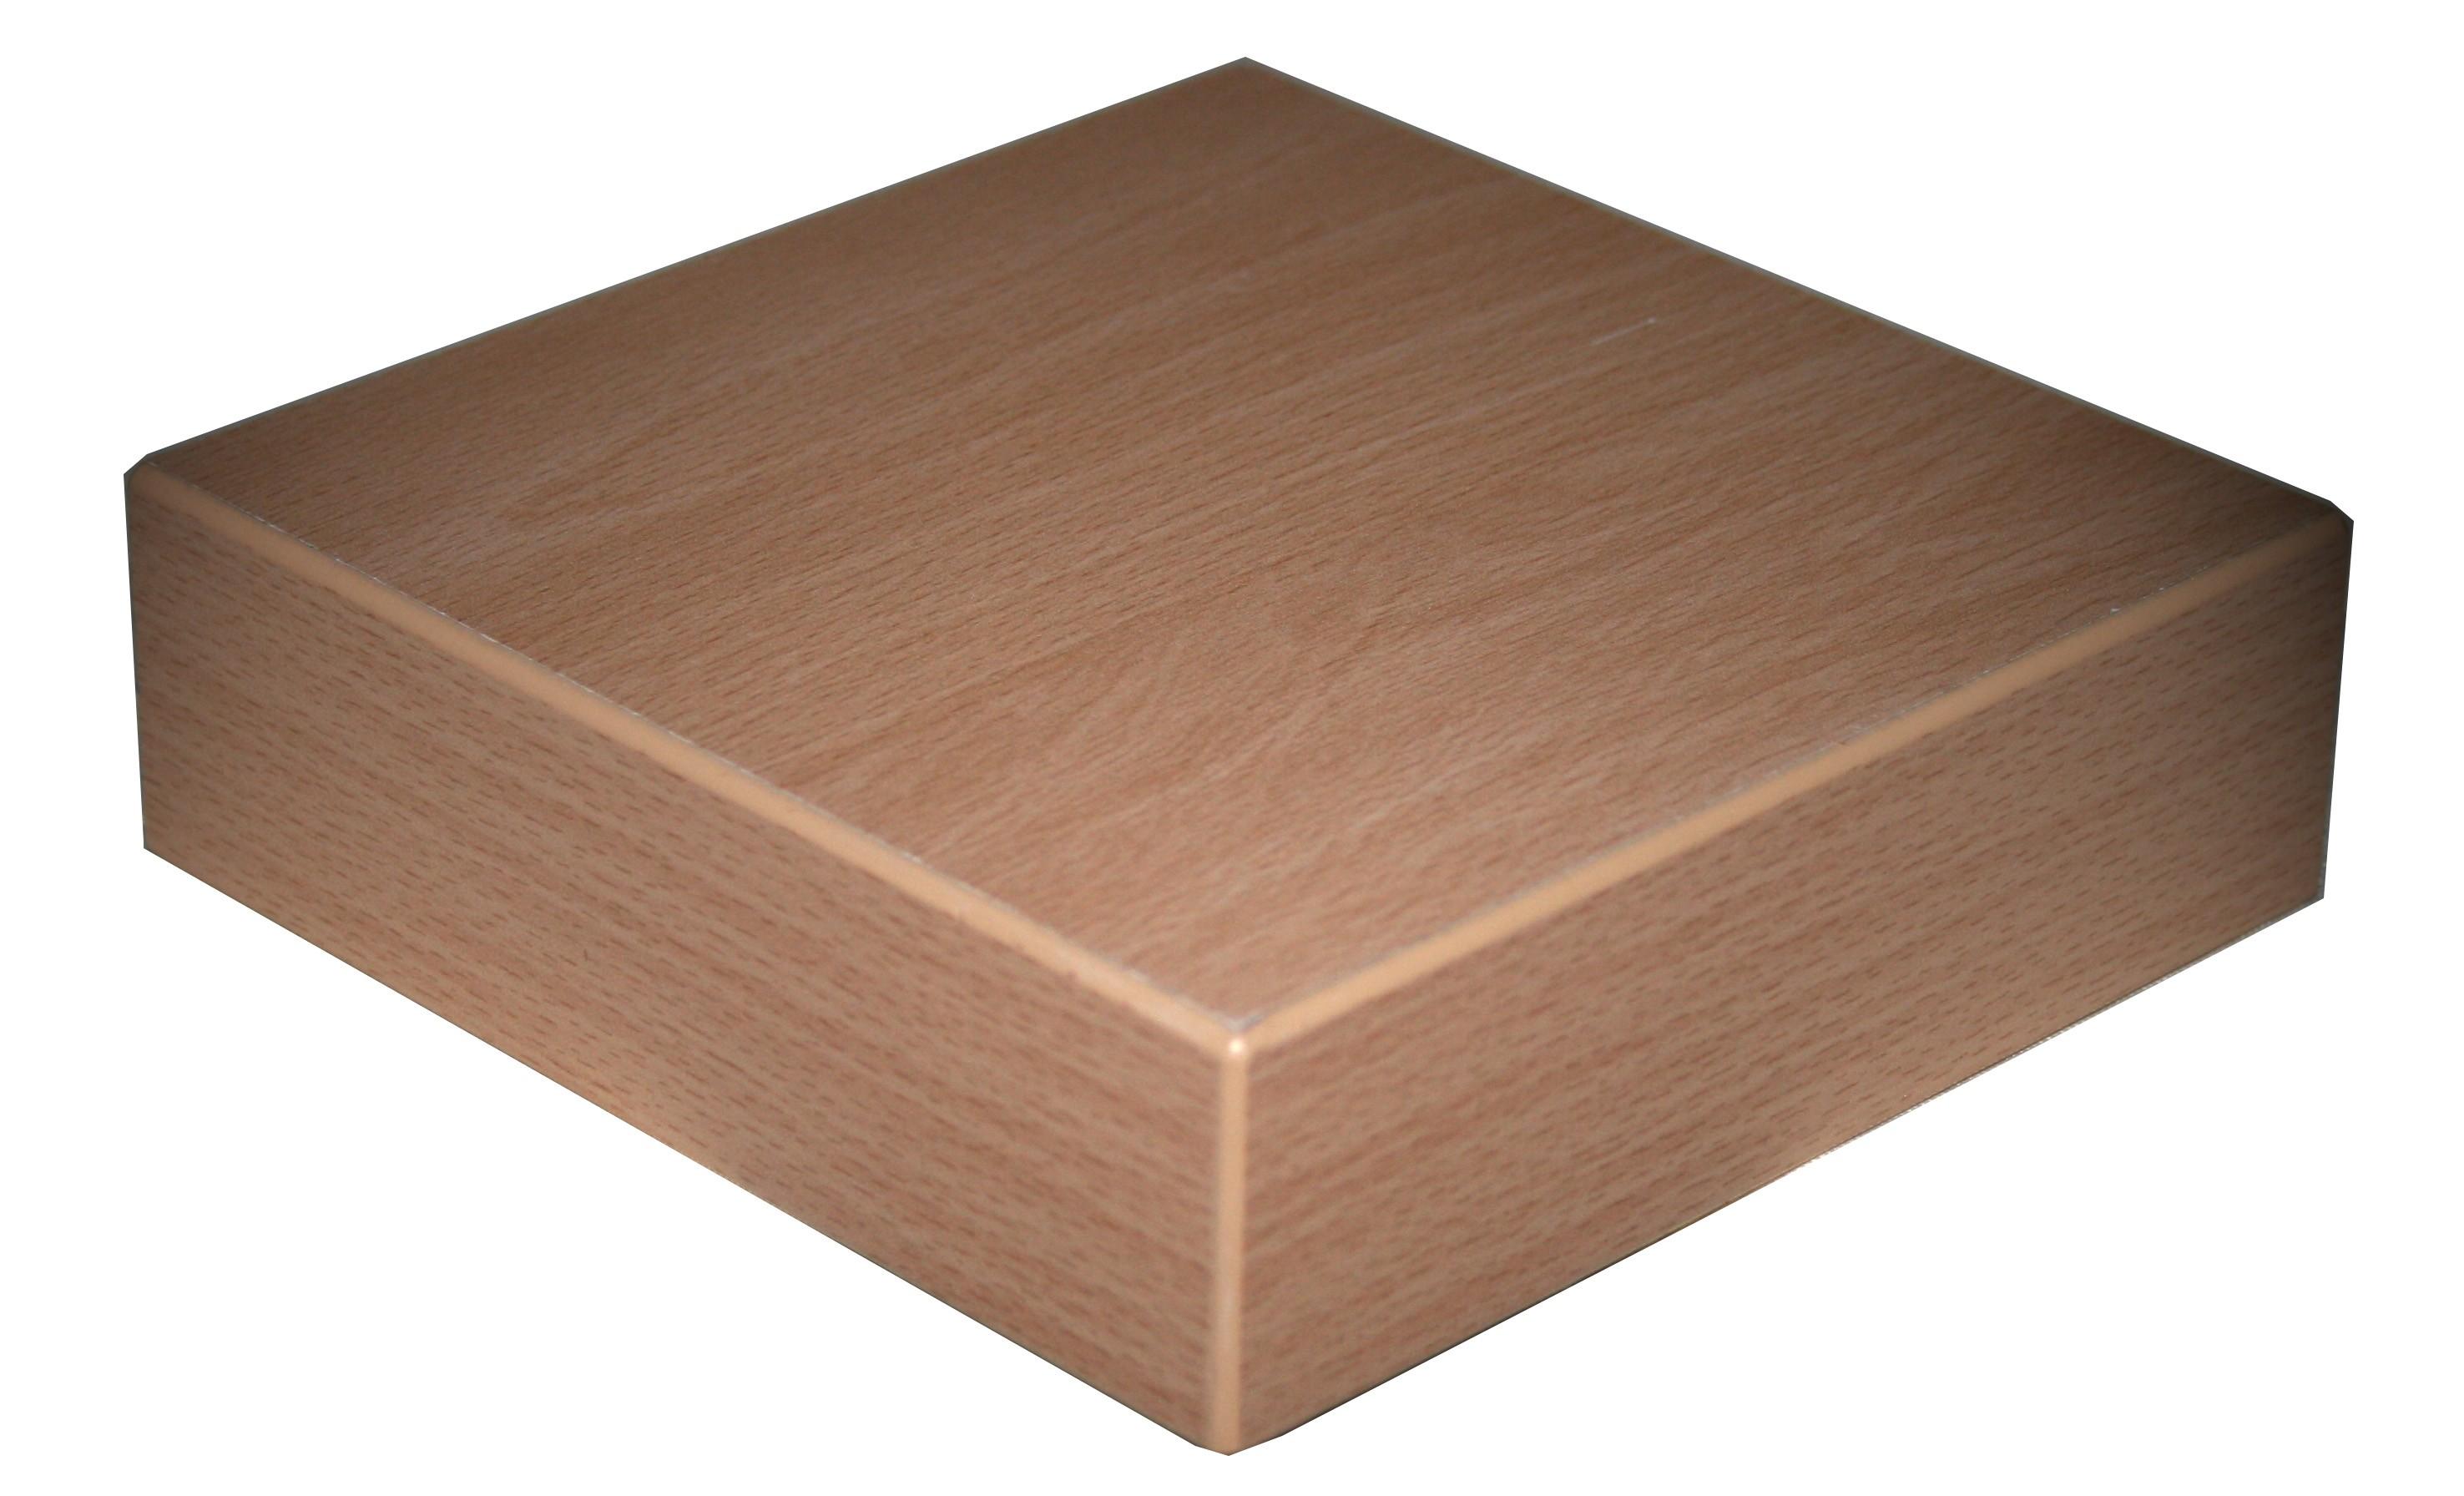 Tischplatte Melamin 41mm 80x80